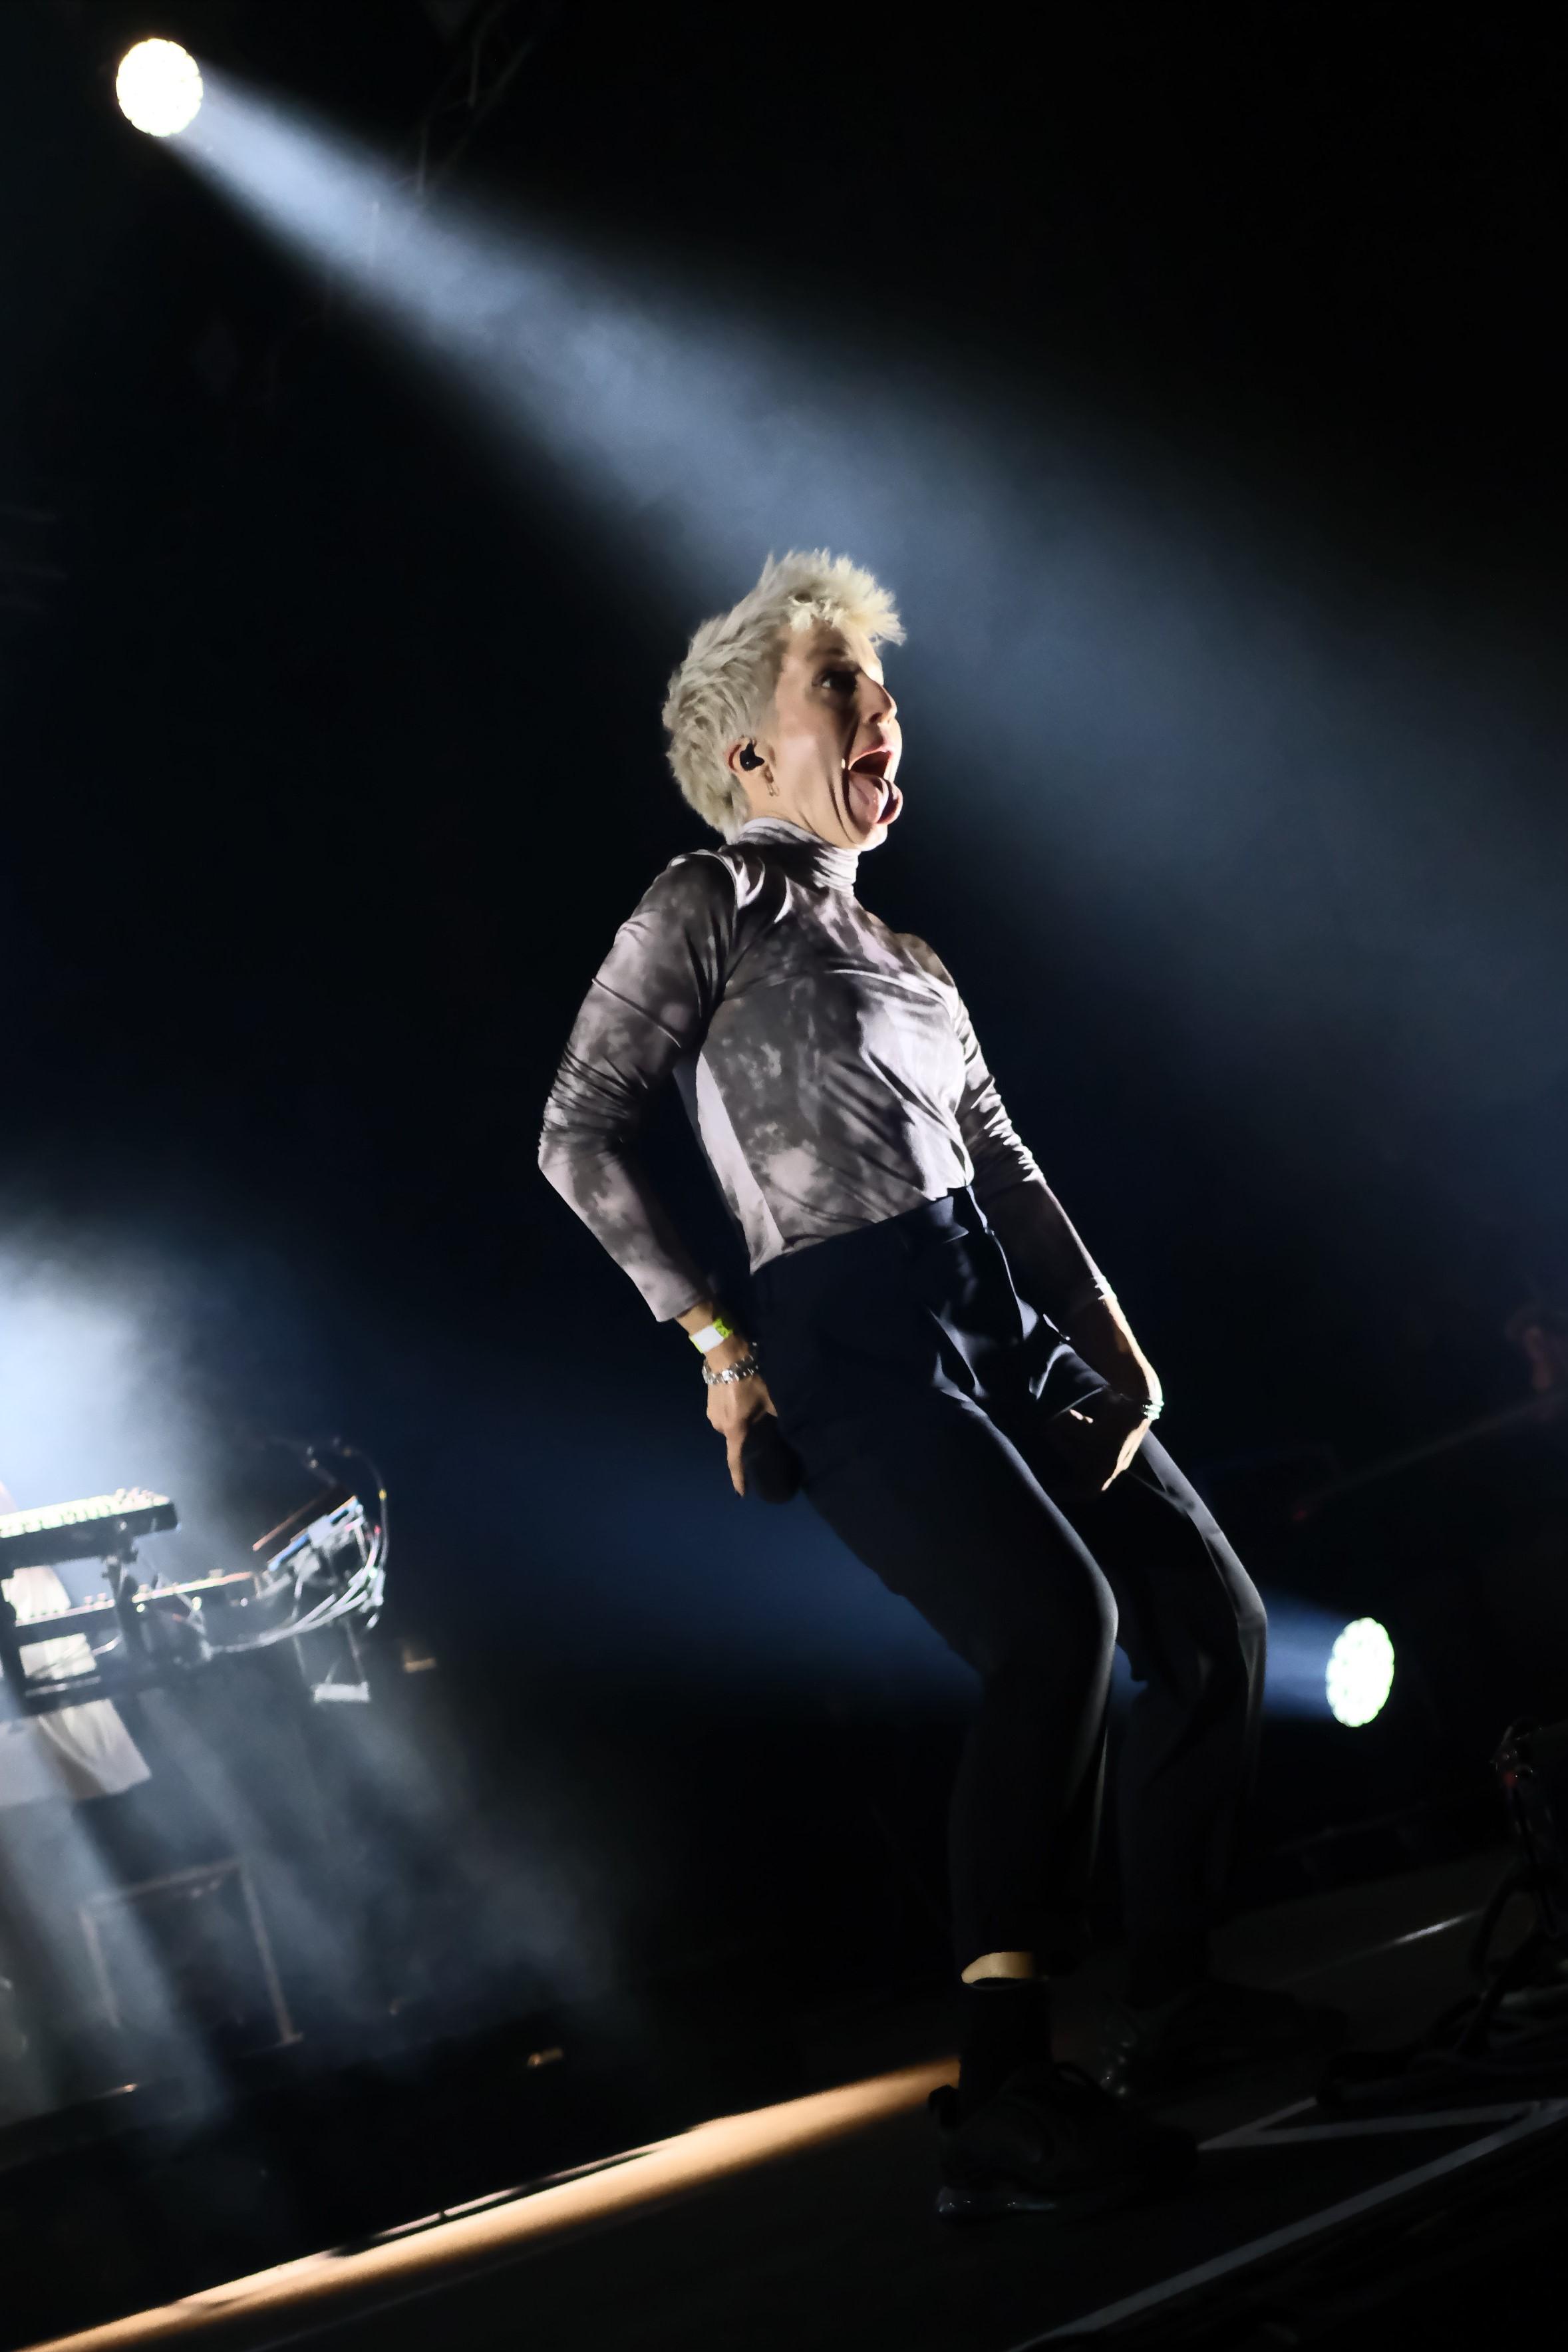 Jeanne Added - Festival Détonation 2019